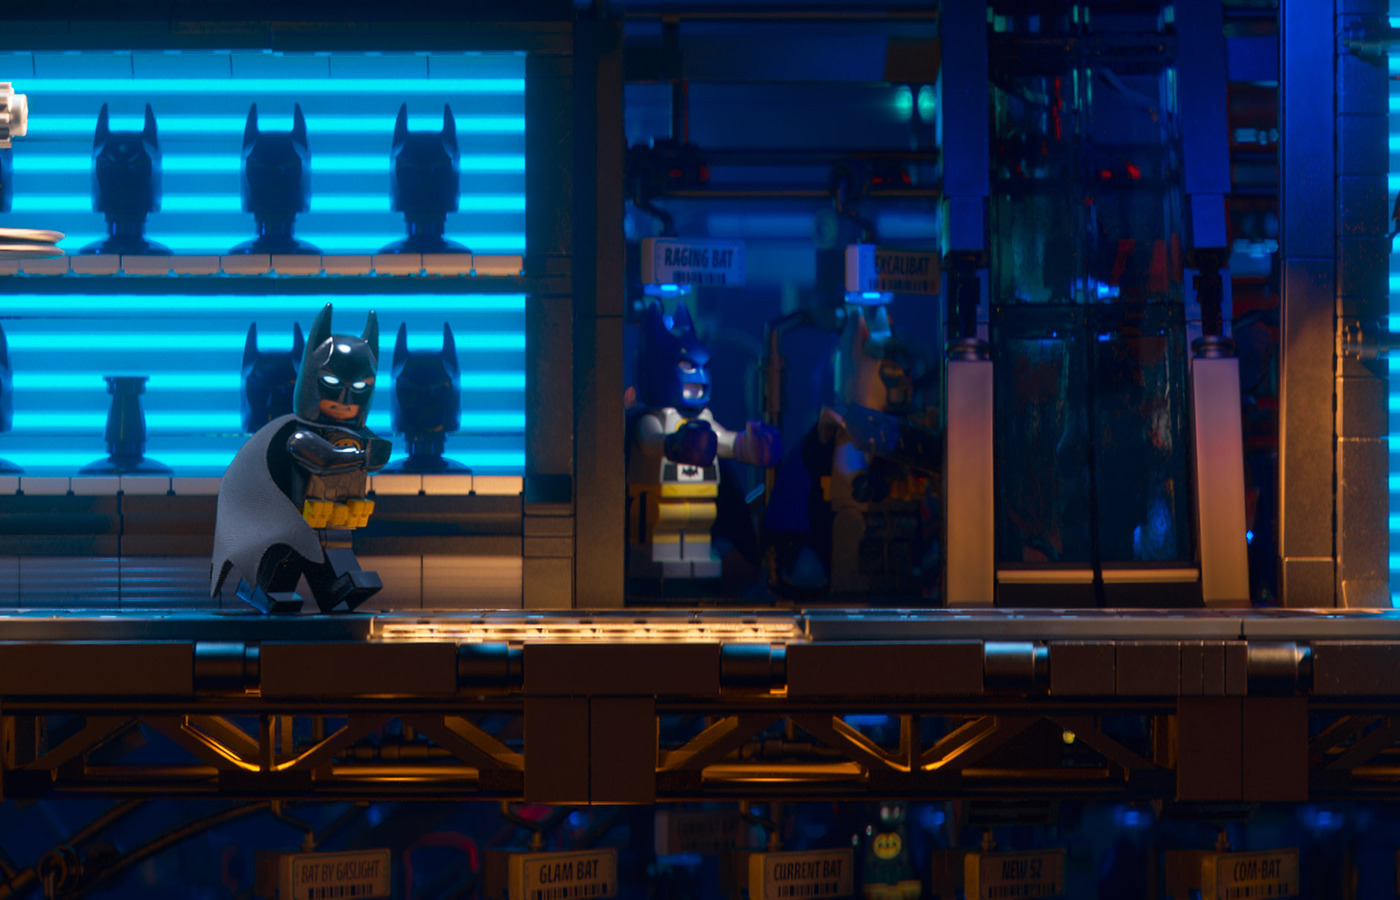 batman-new-animated-movie-2017-qhd.jpg